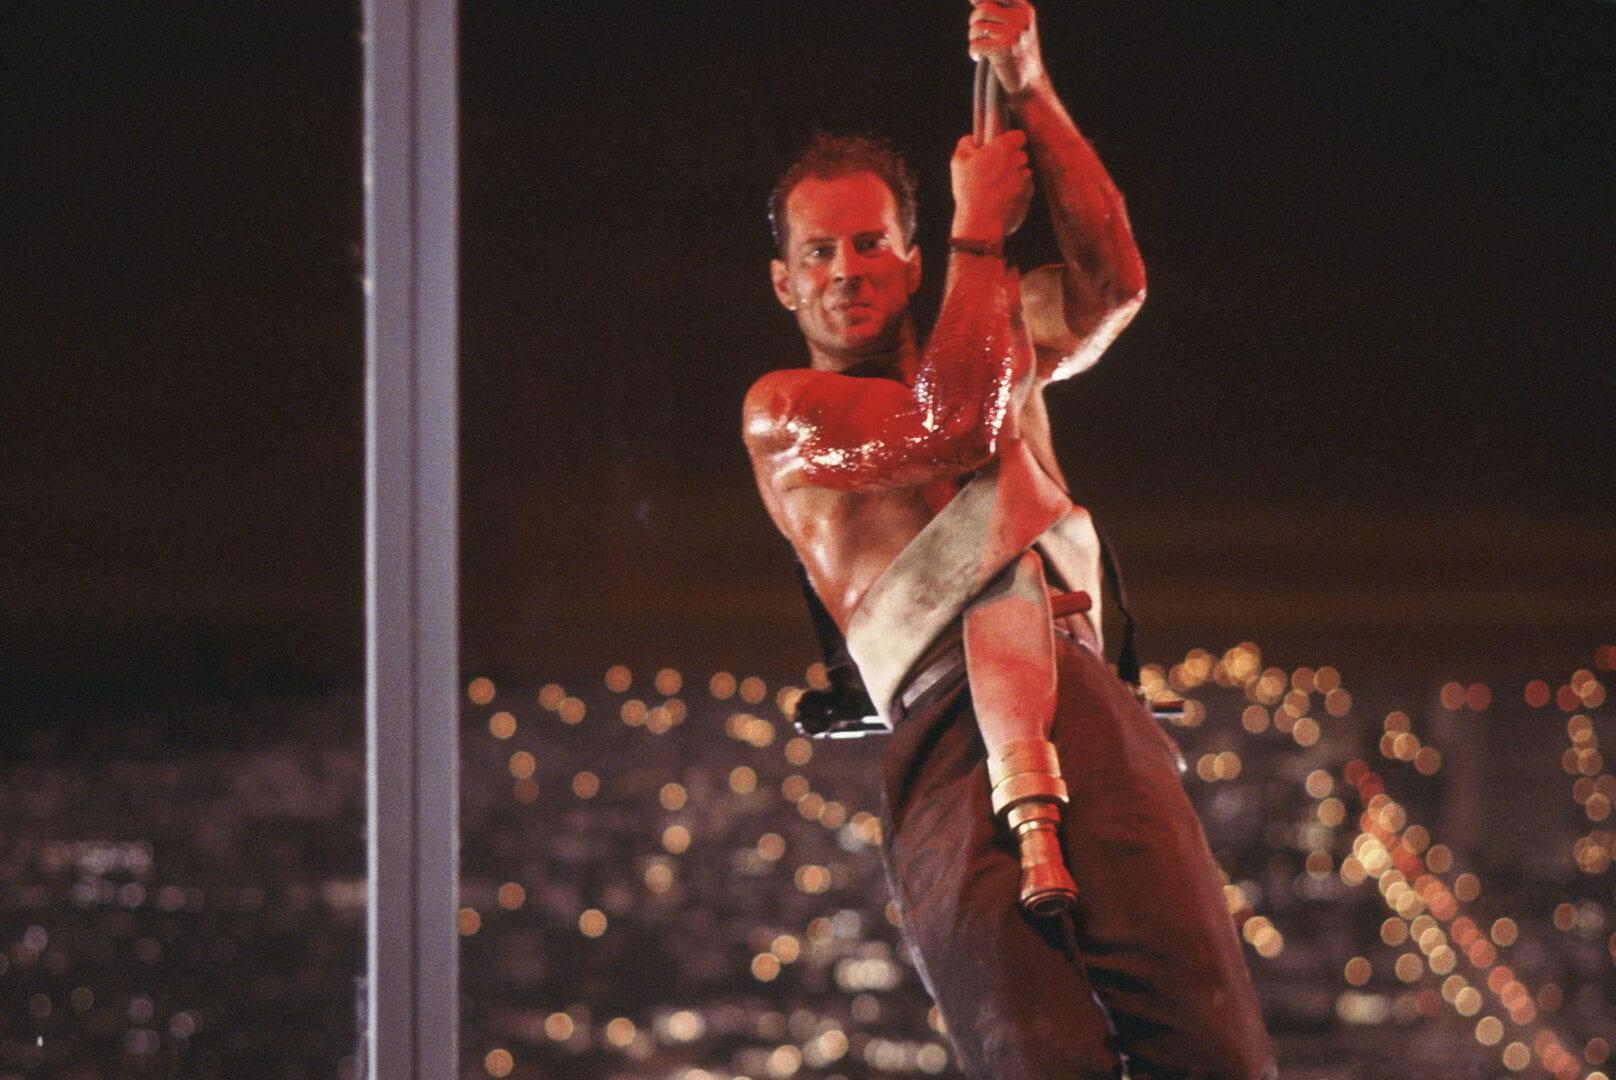 DIE HARD, John McClane, Bruce Willis, Yippee-ki-yay